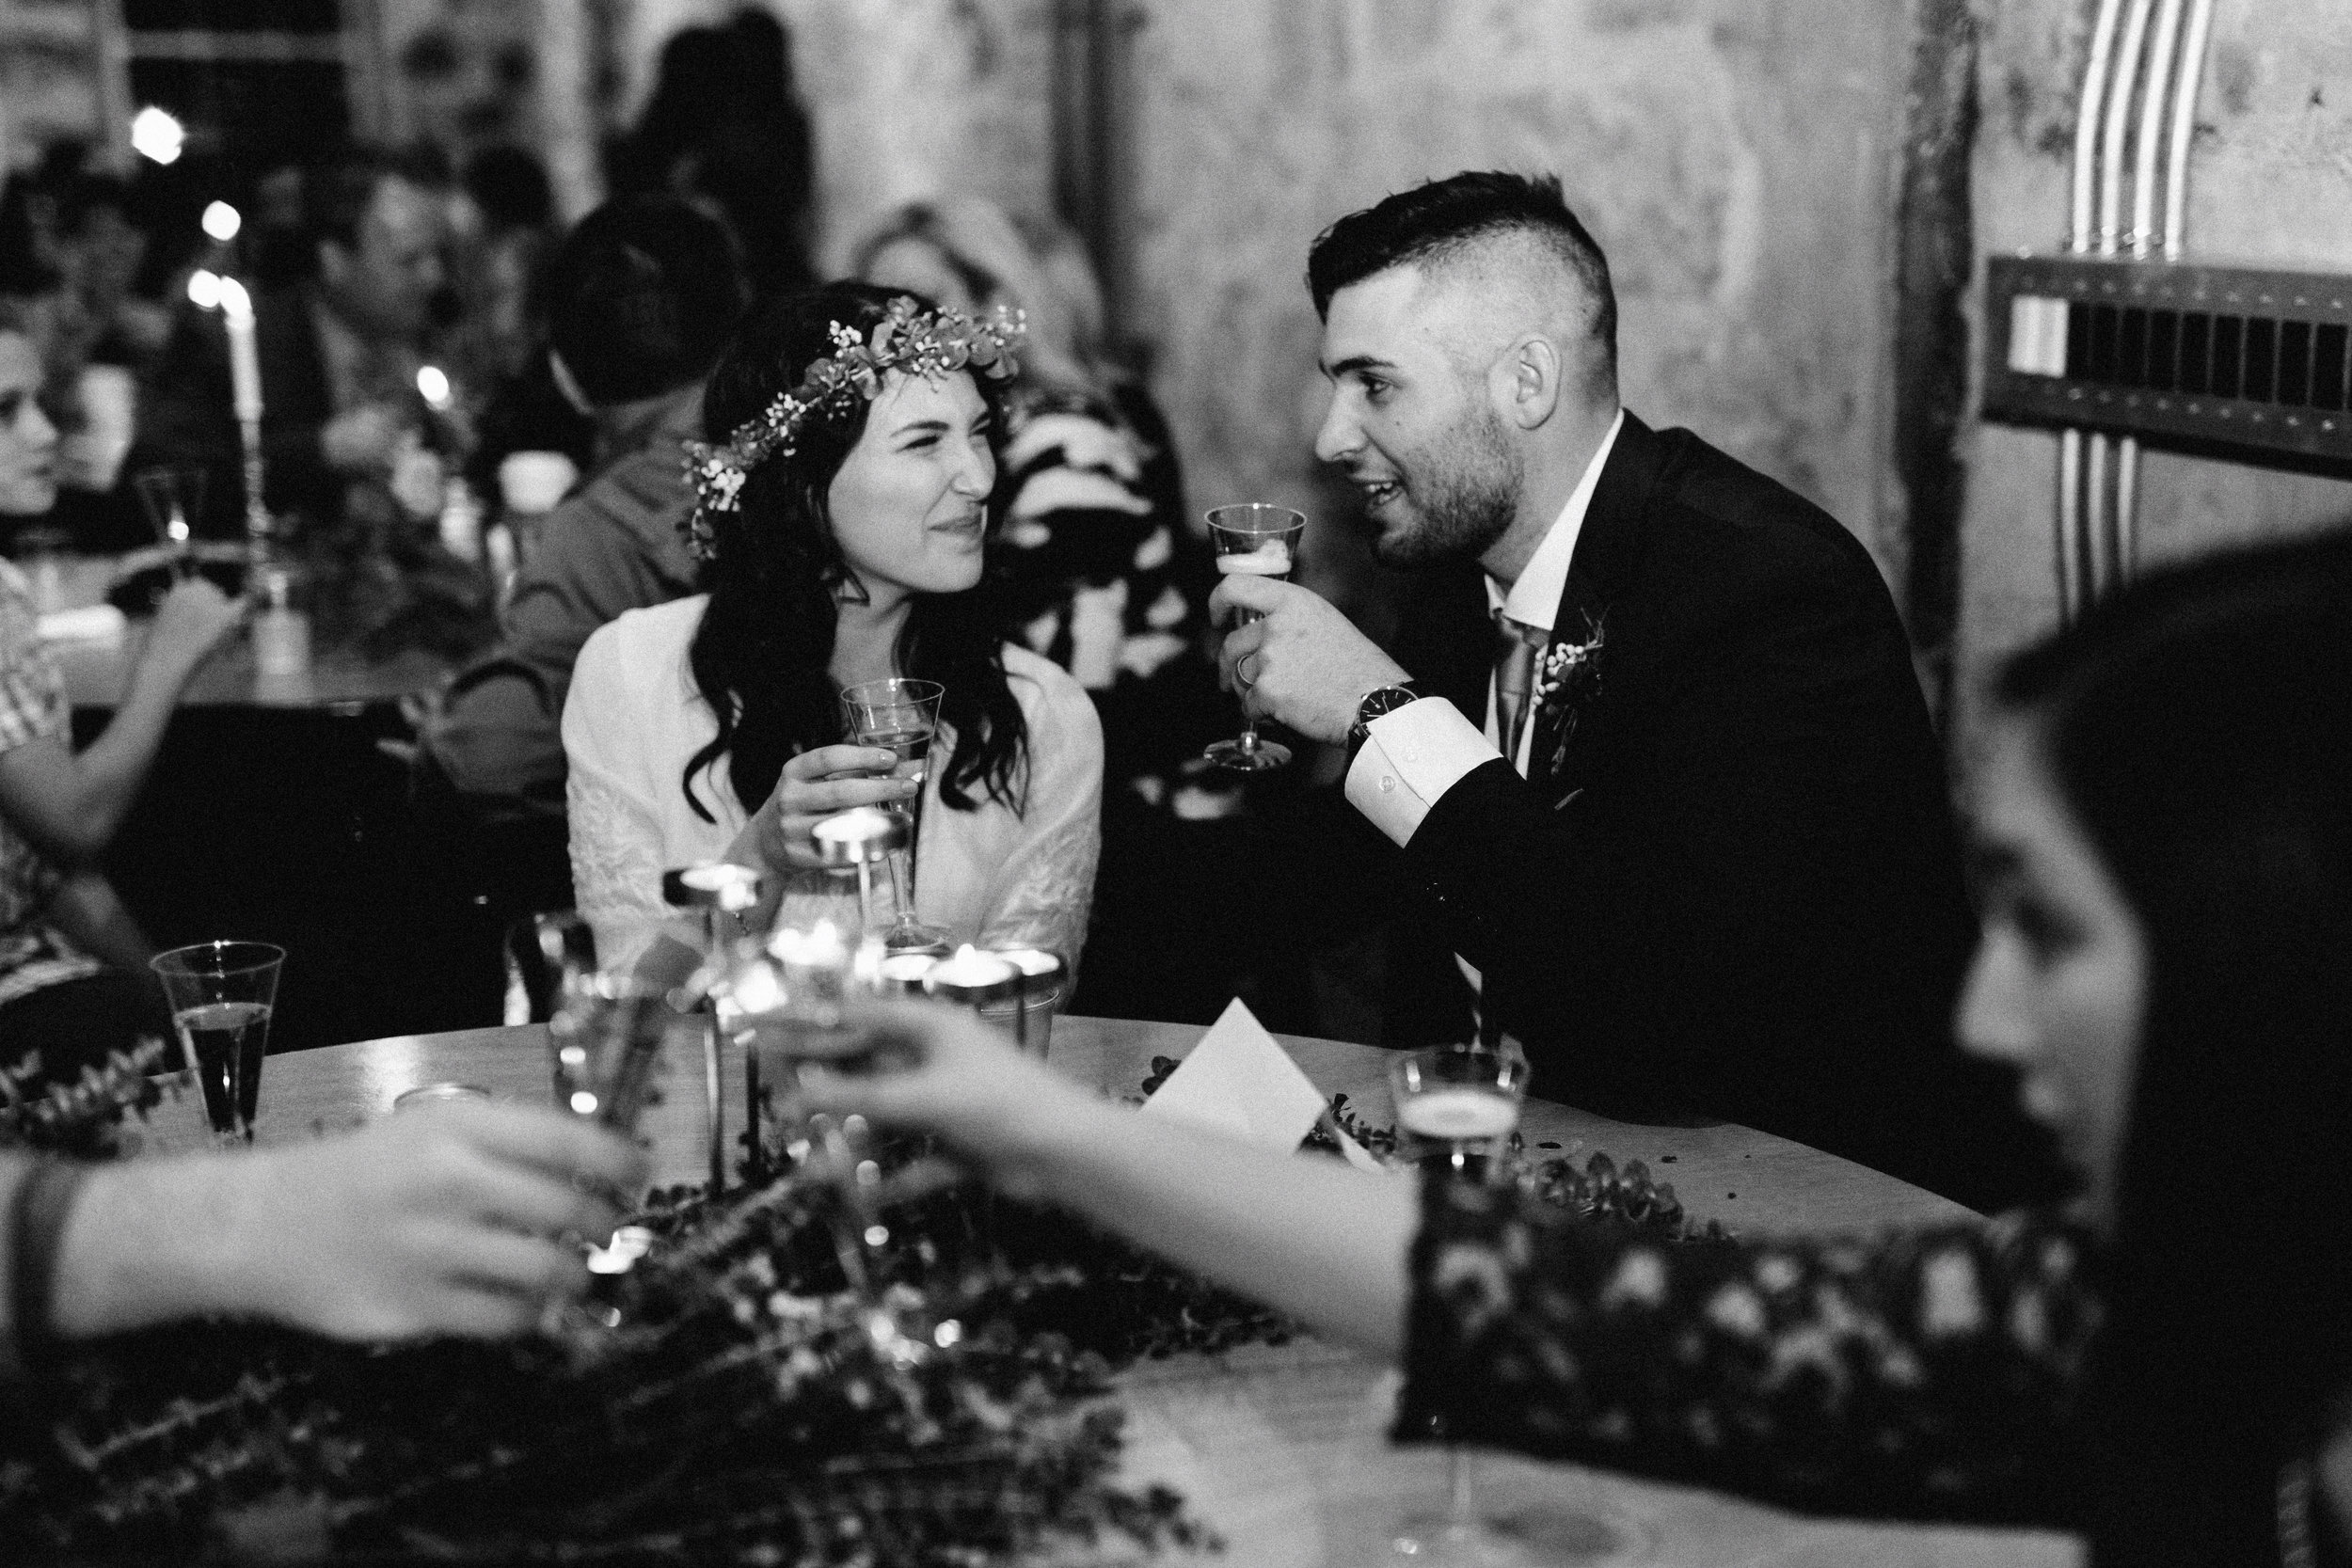 austin-wedding-photographer-59.jpg